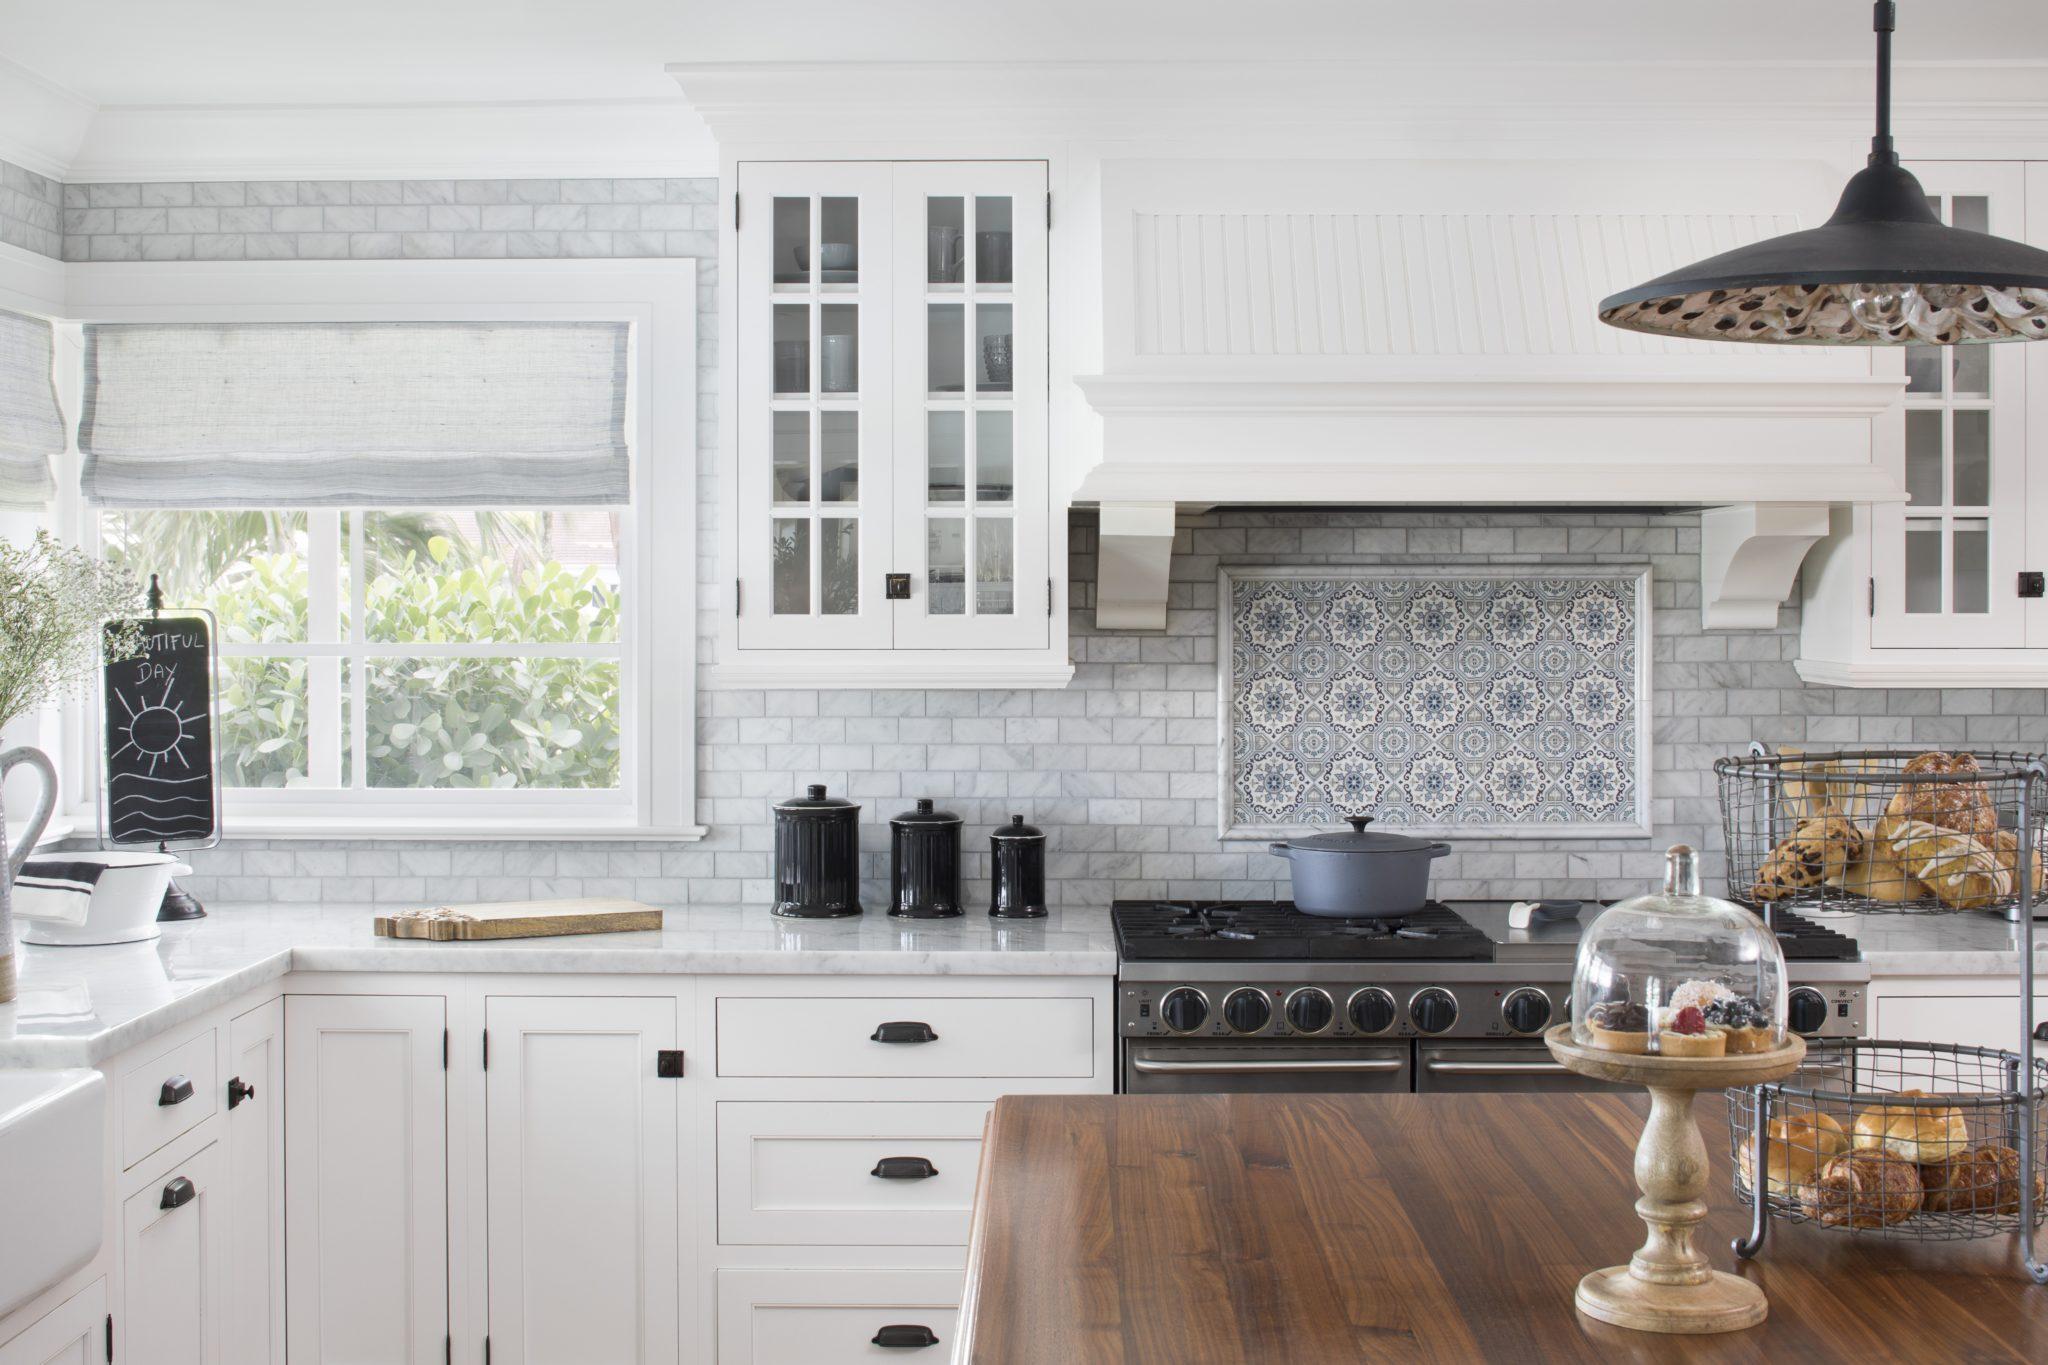 Farmhouse Coastal Kitchen with hand painted carrara marble backsplash by Lisa Michael Interiors